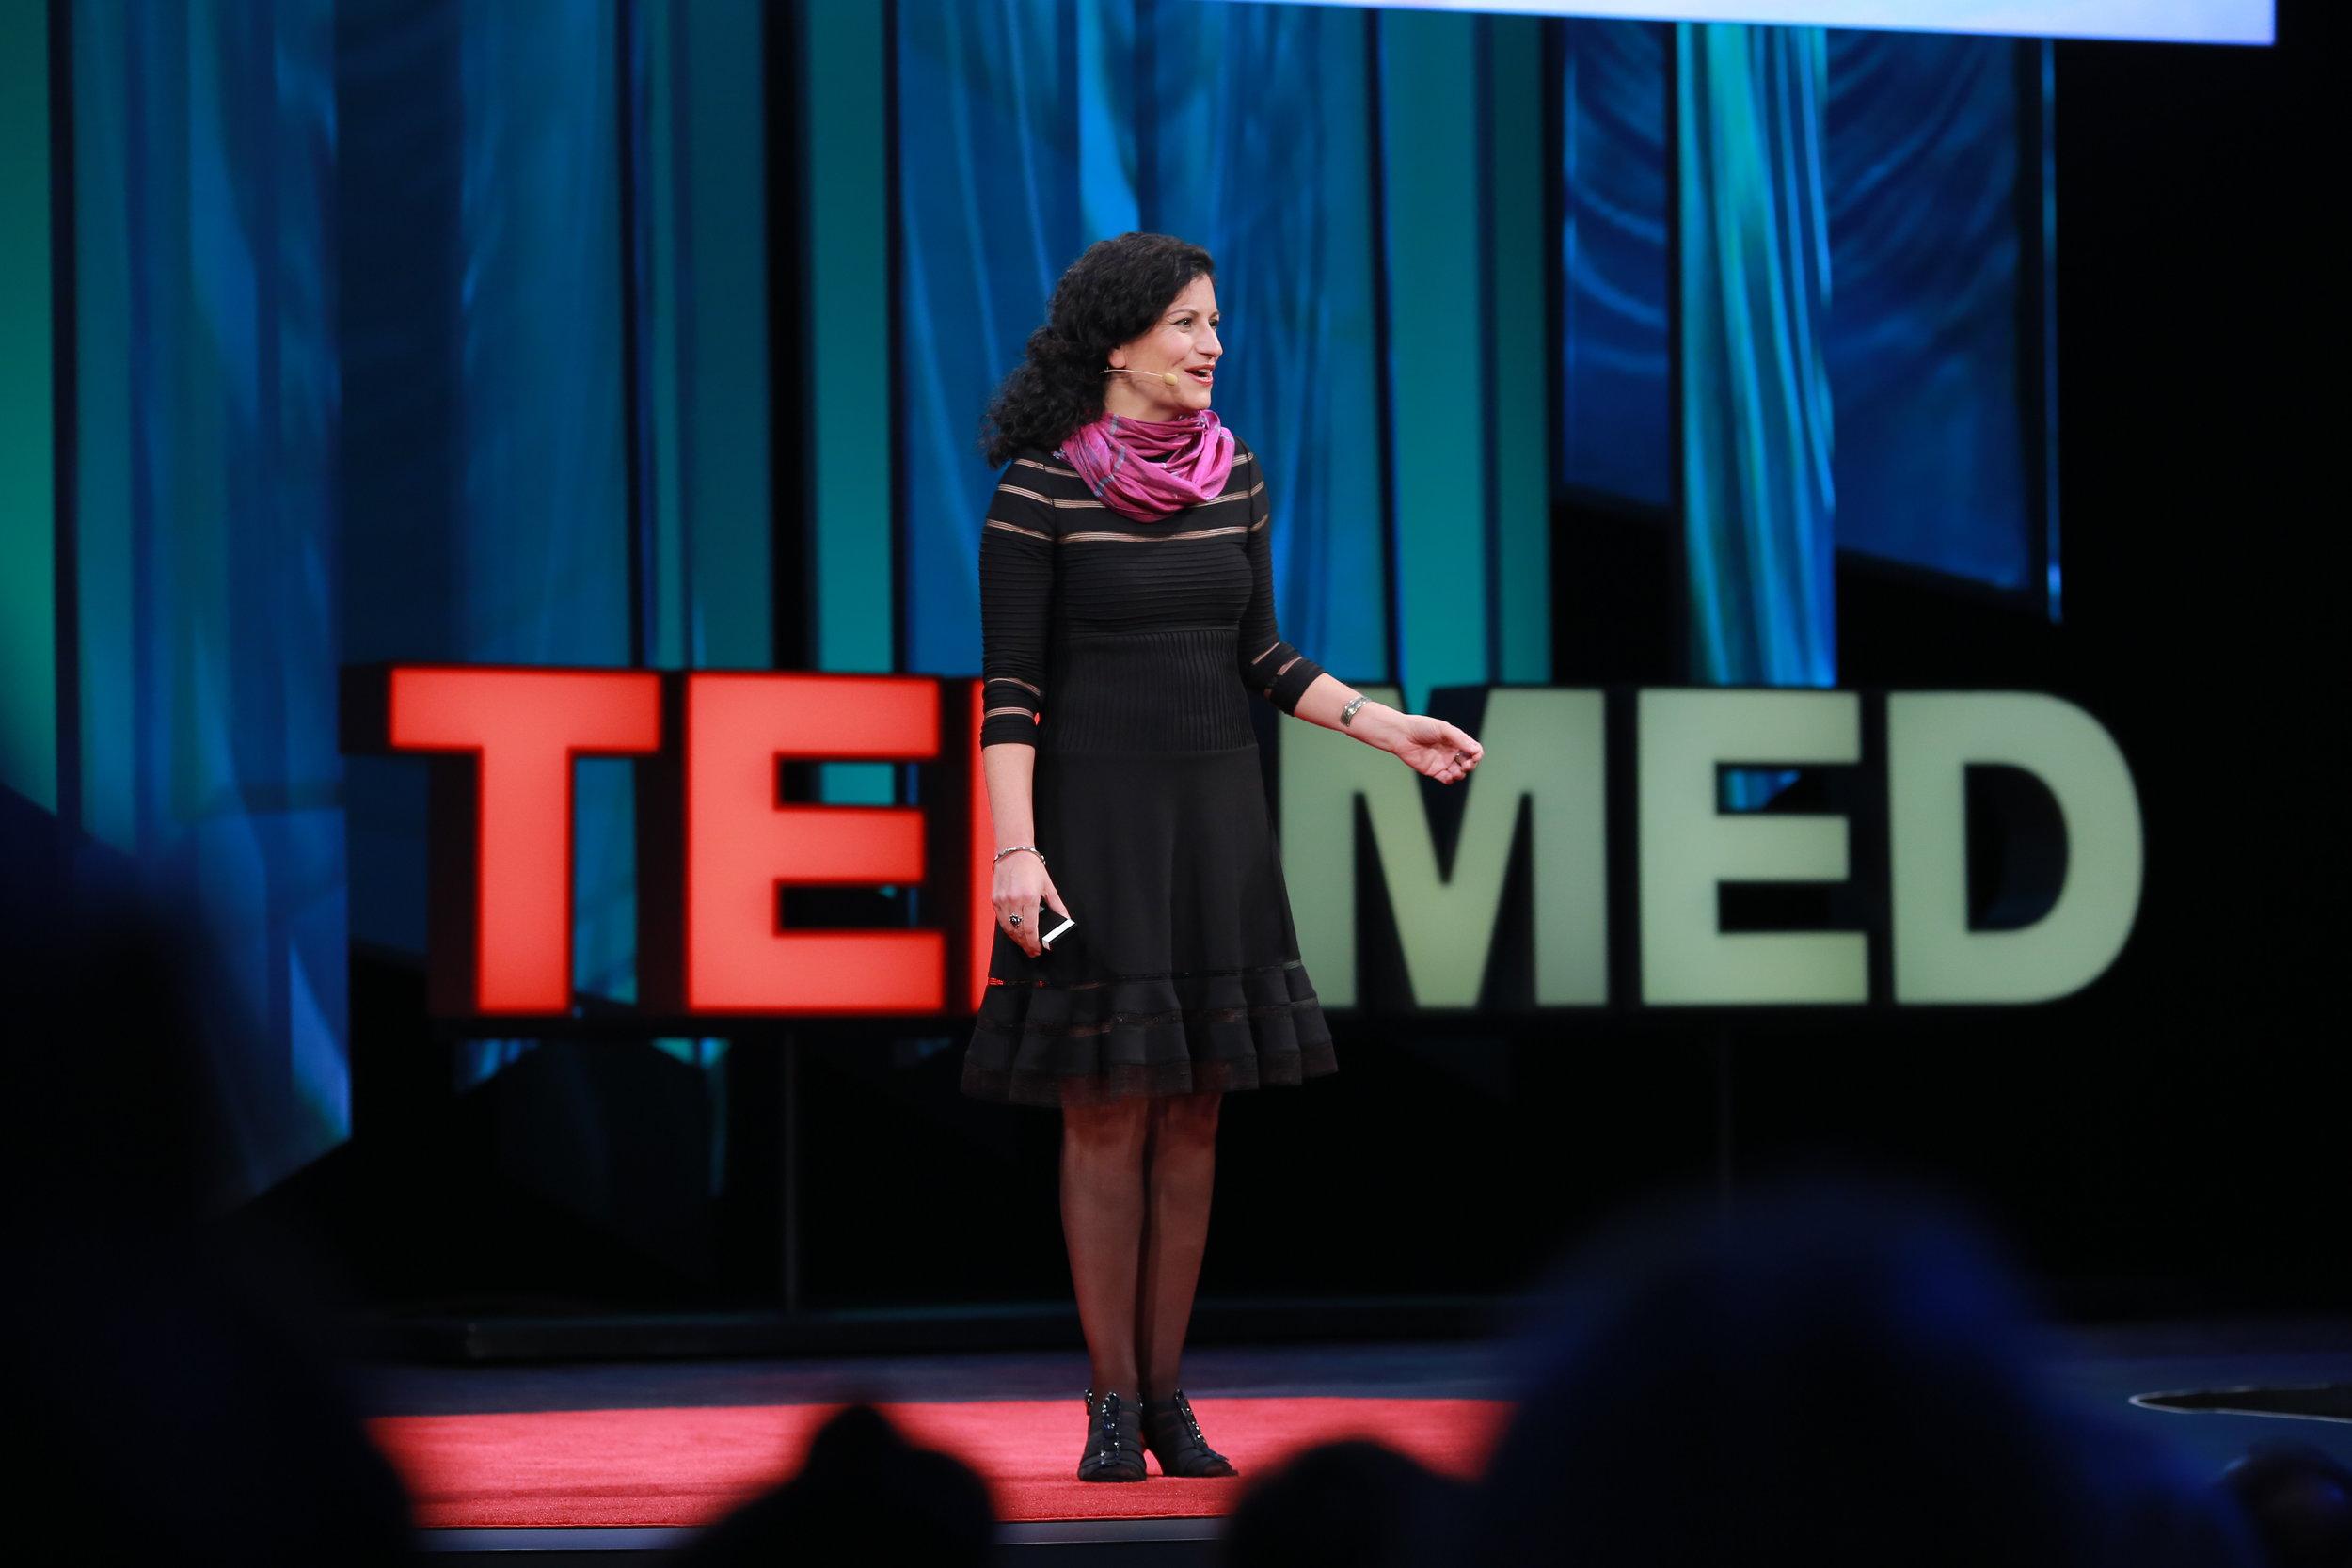 Photo credit: TEDMED